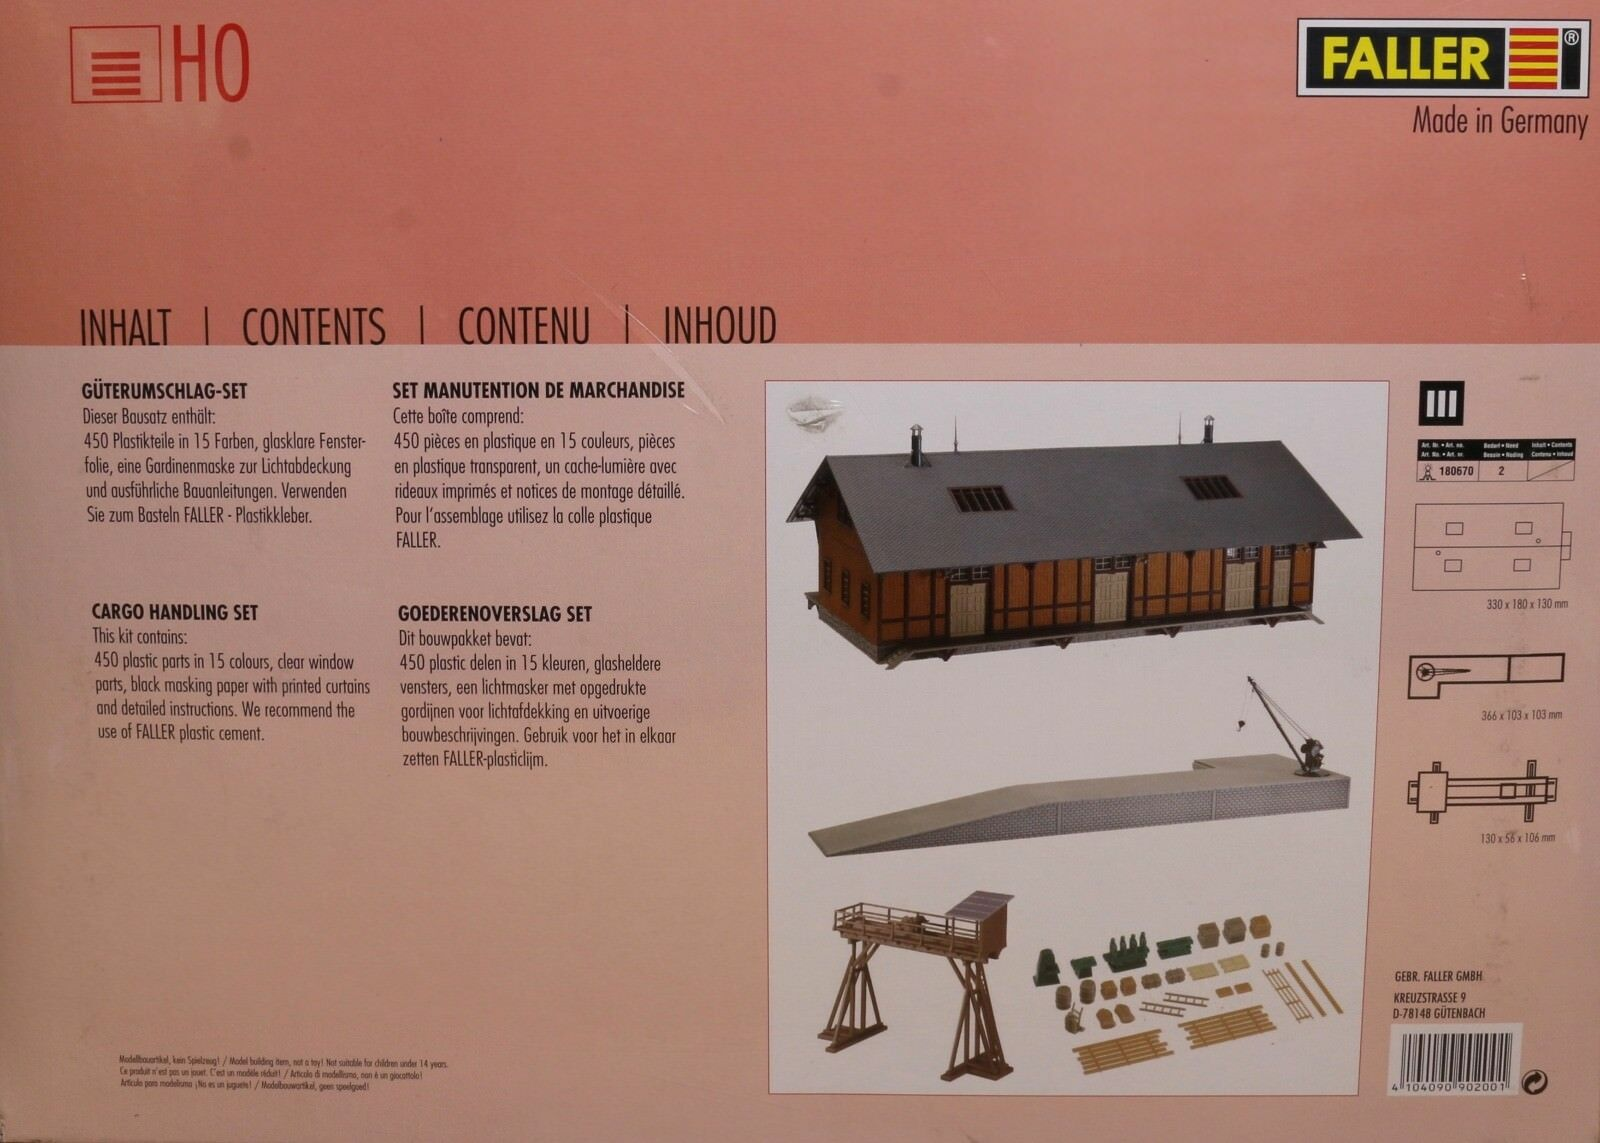 Faller 190200, traccia h0, KIT trasbordo-Set Cargo Handling Set Set Set 92792e